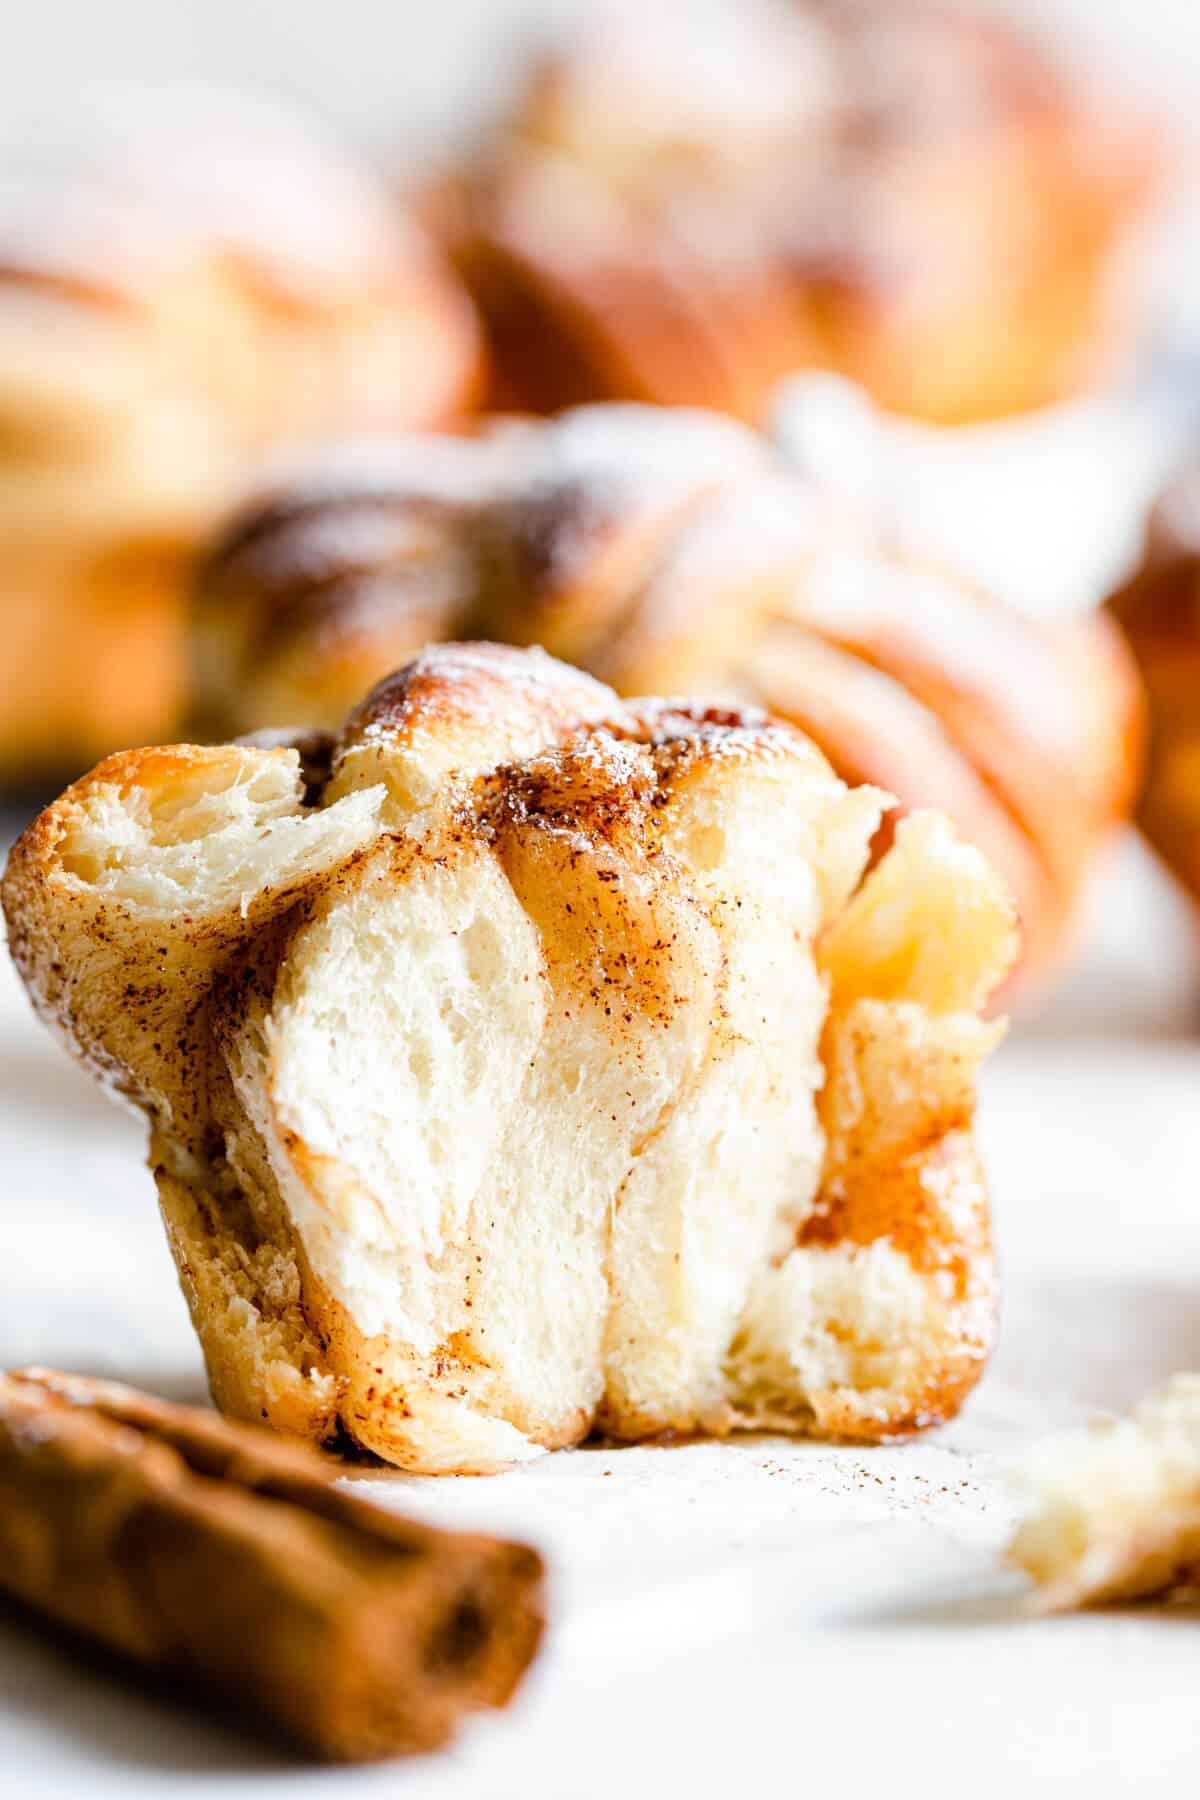 straight-ahead super close up revealing the fluffy texture inside the cinnamon bun